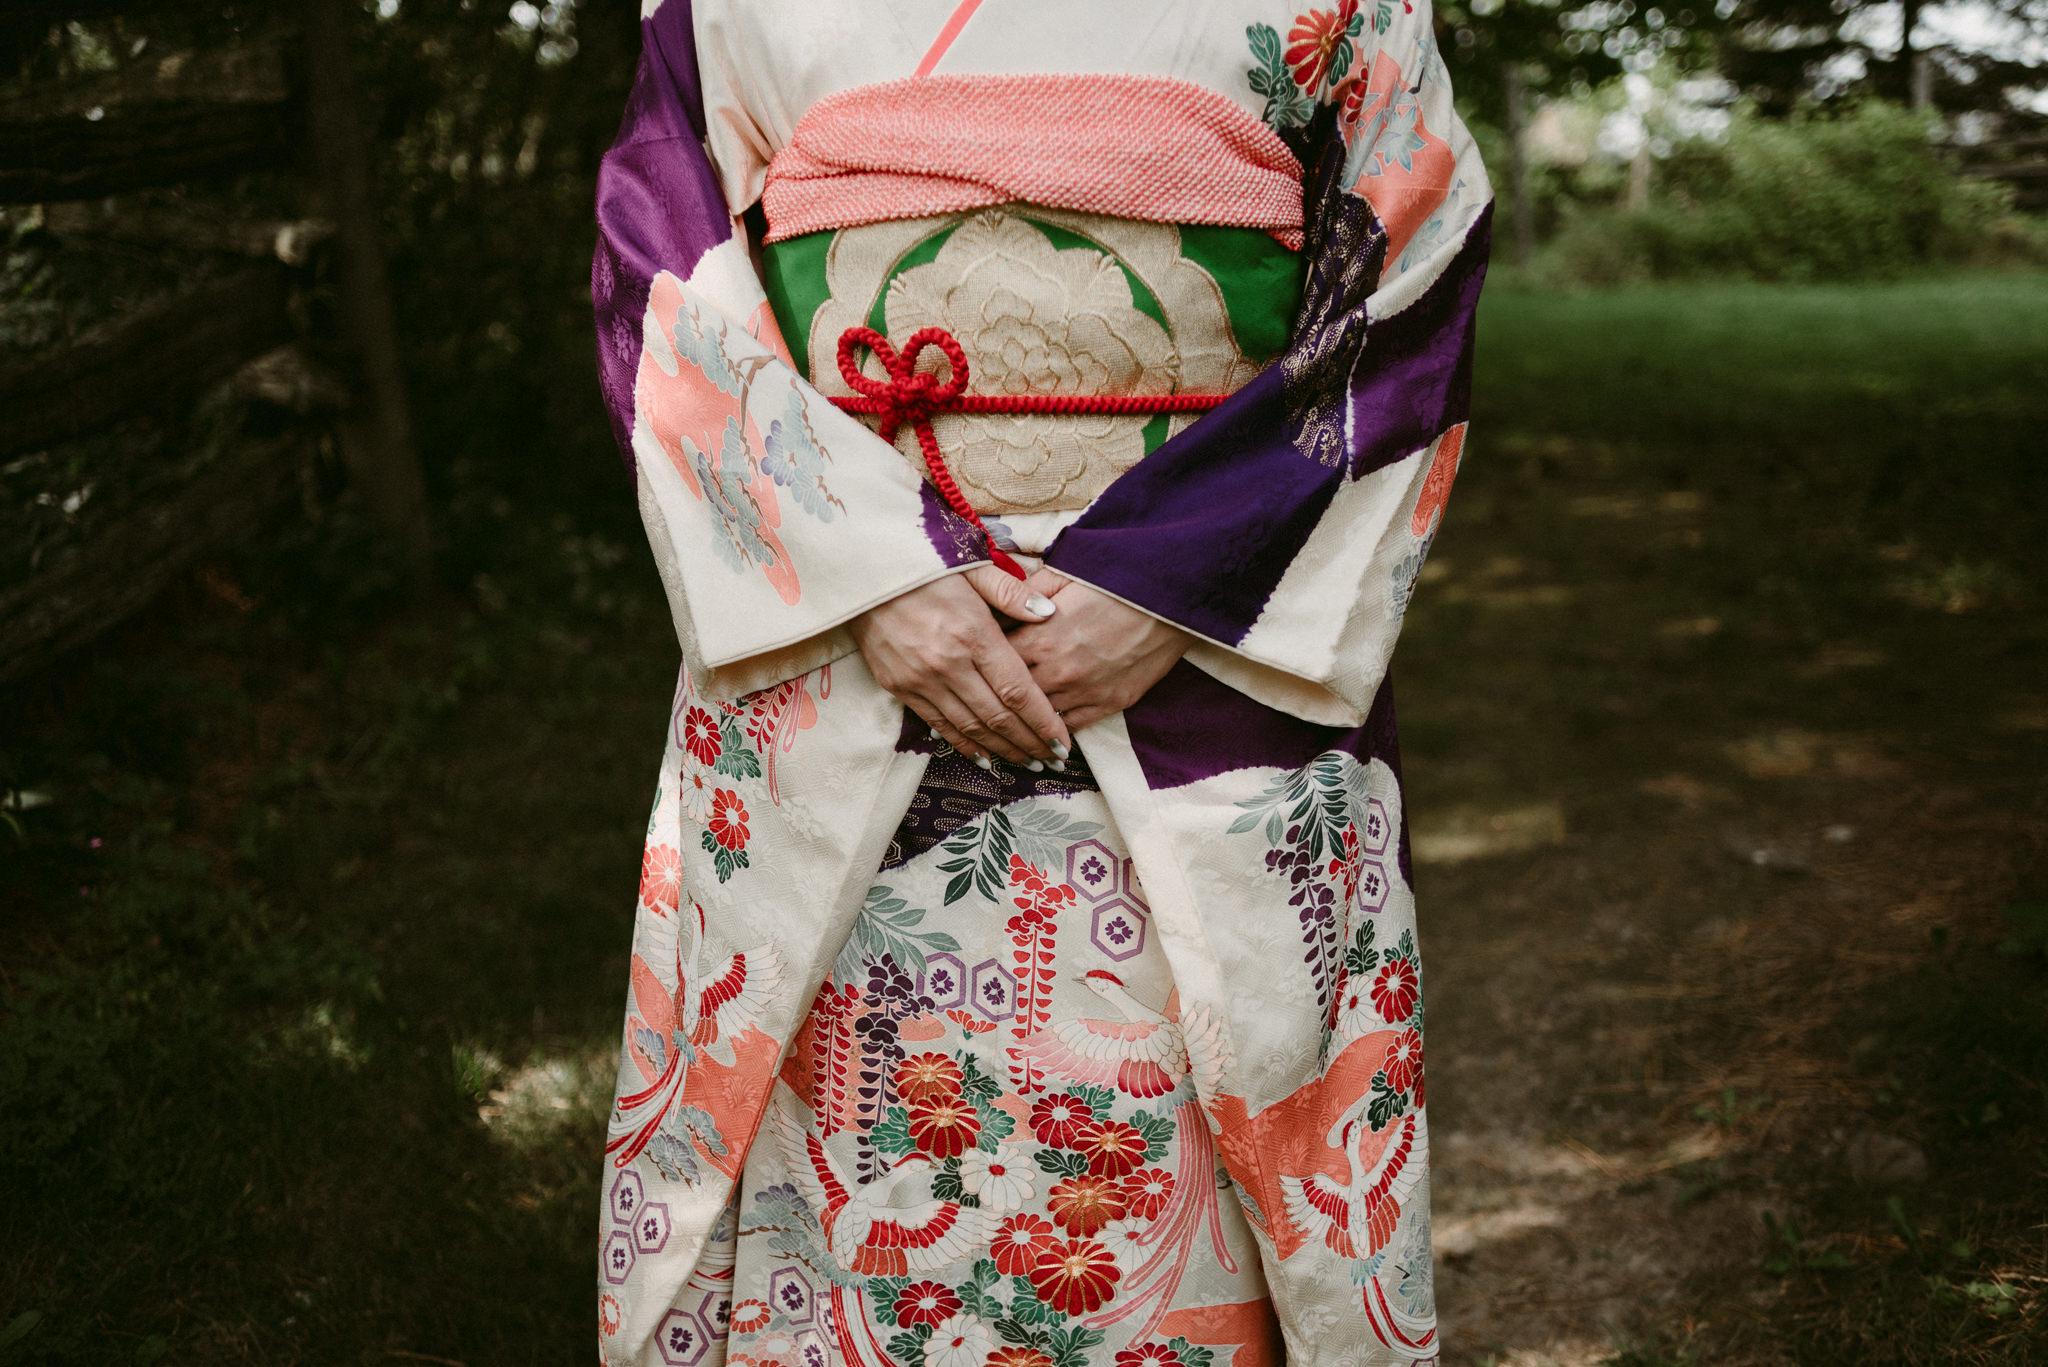 Kimono details and hands